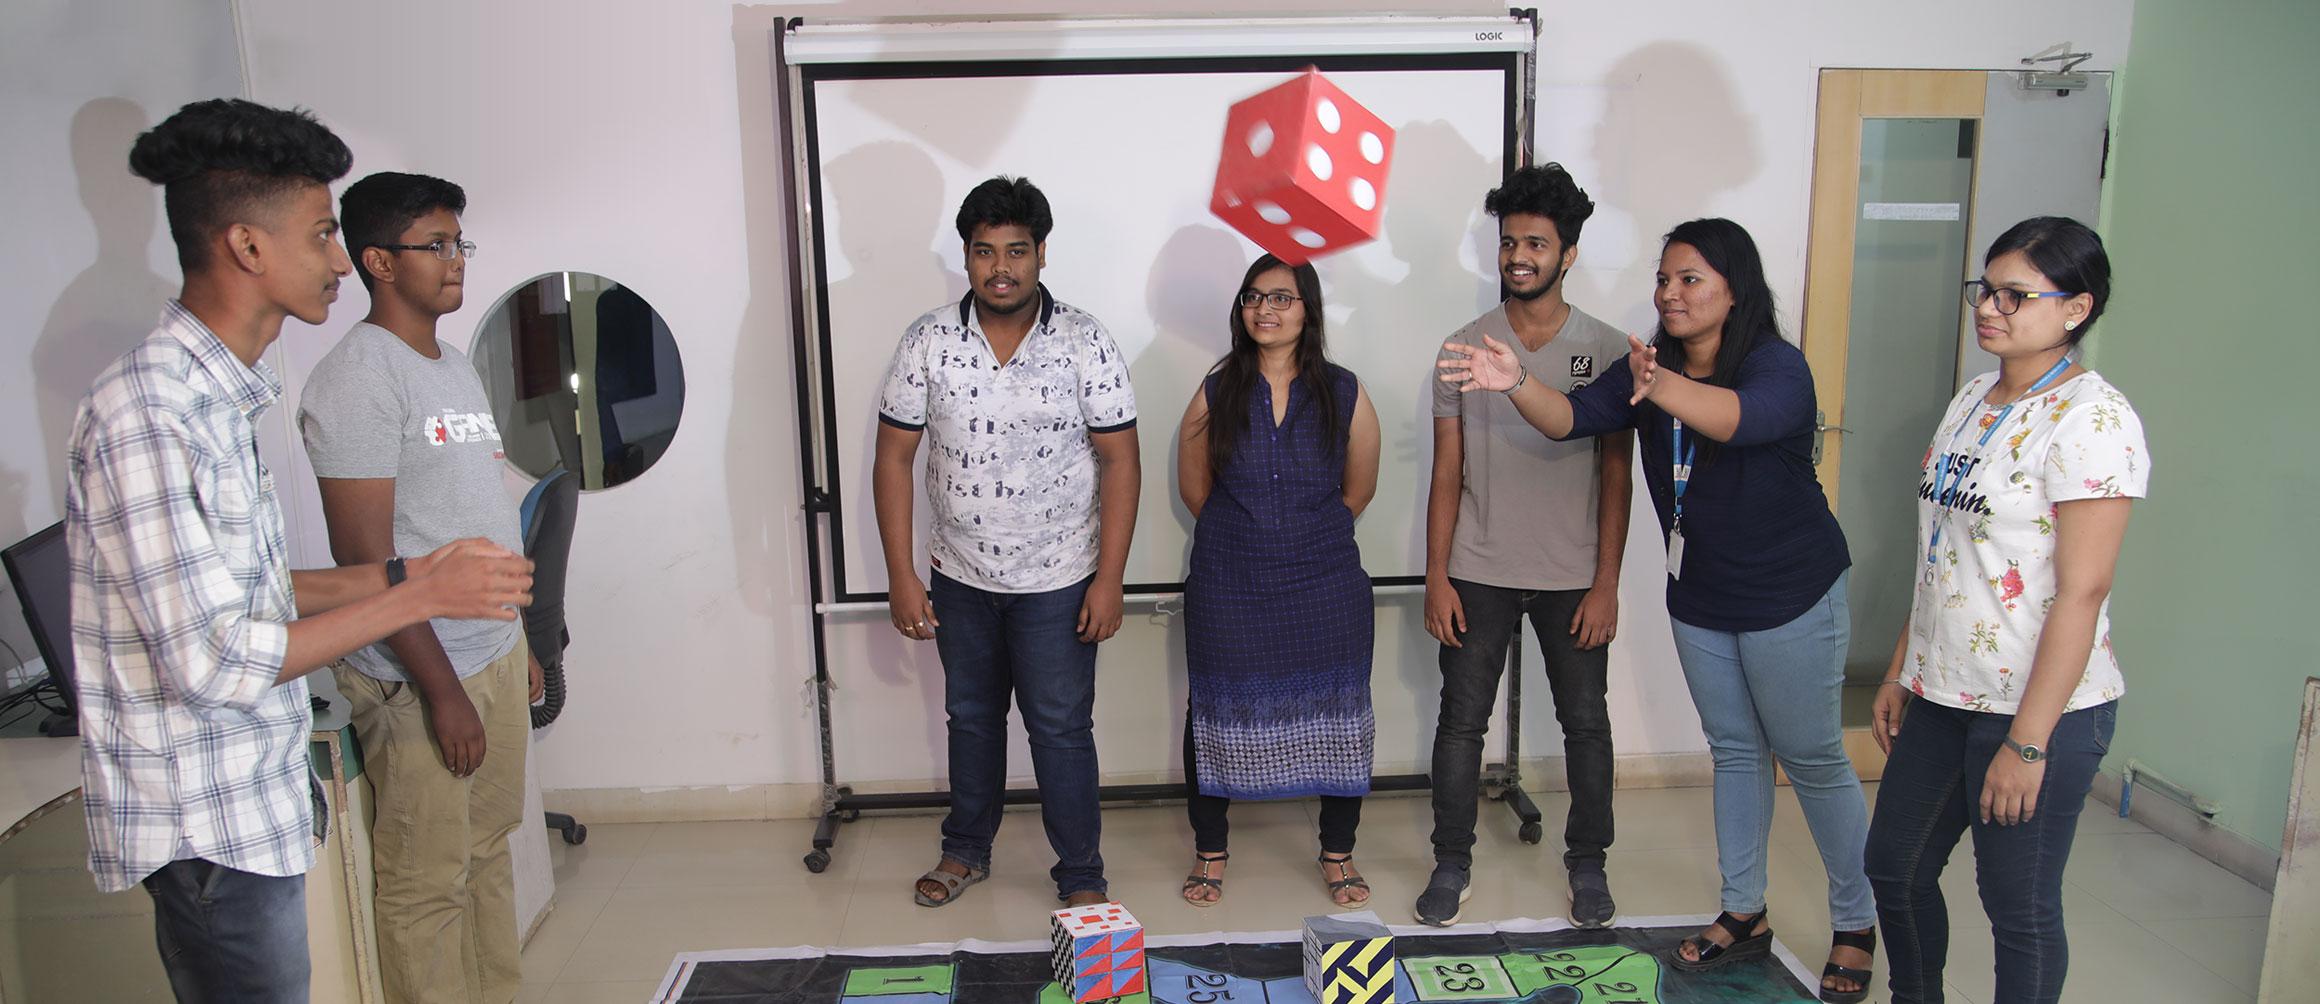 Game Design Developemnt College Course In Chennai - Game design courses